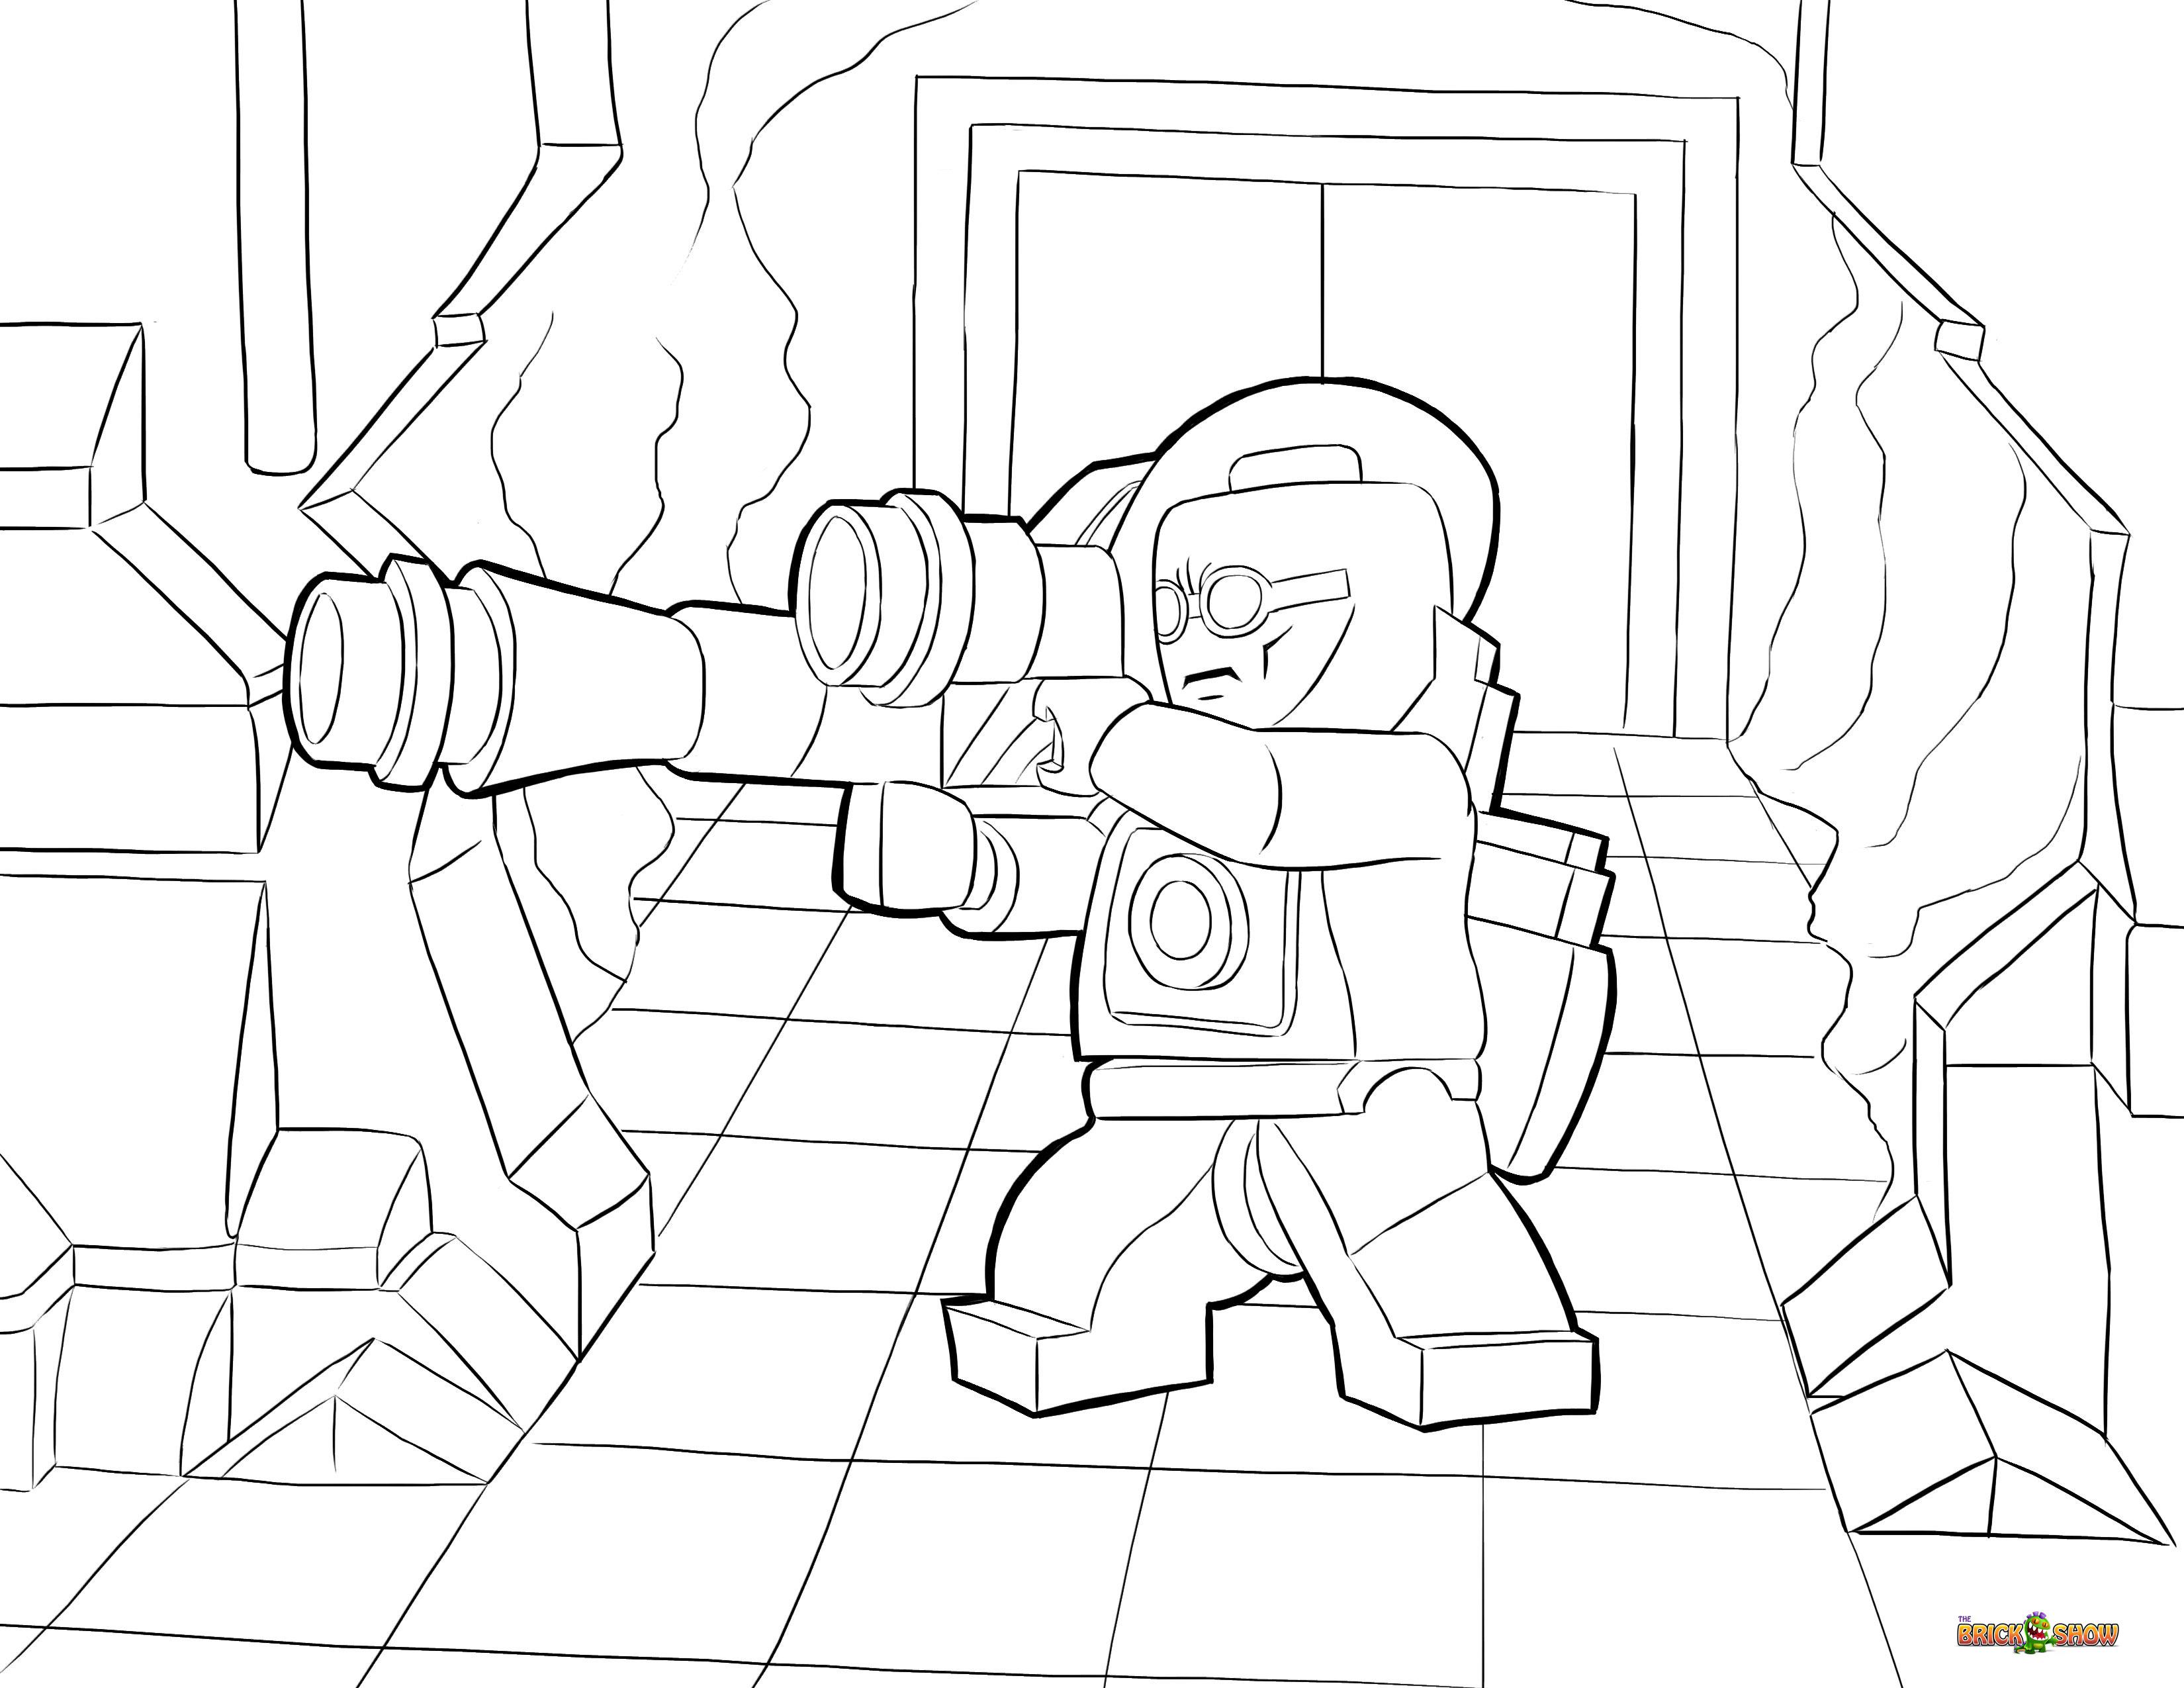 Lego Brick Drawing at GetDrawings | Free download